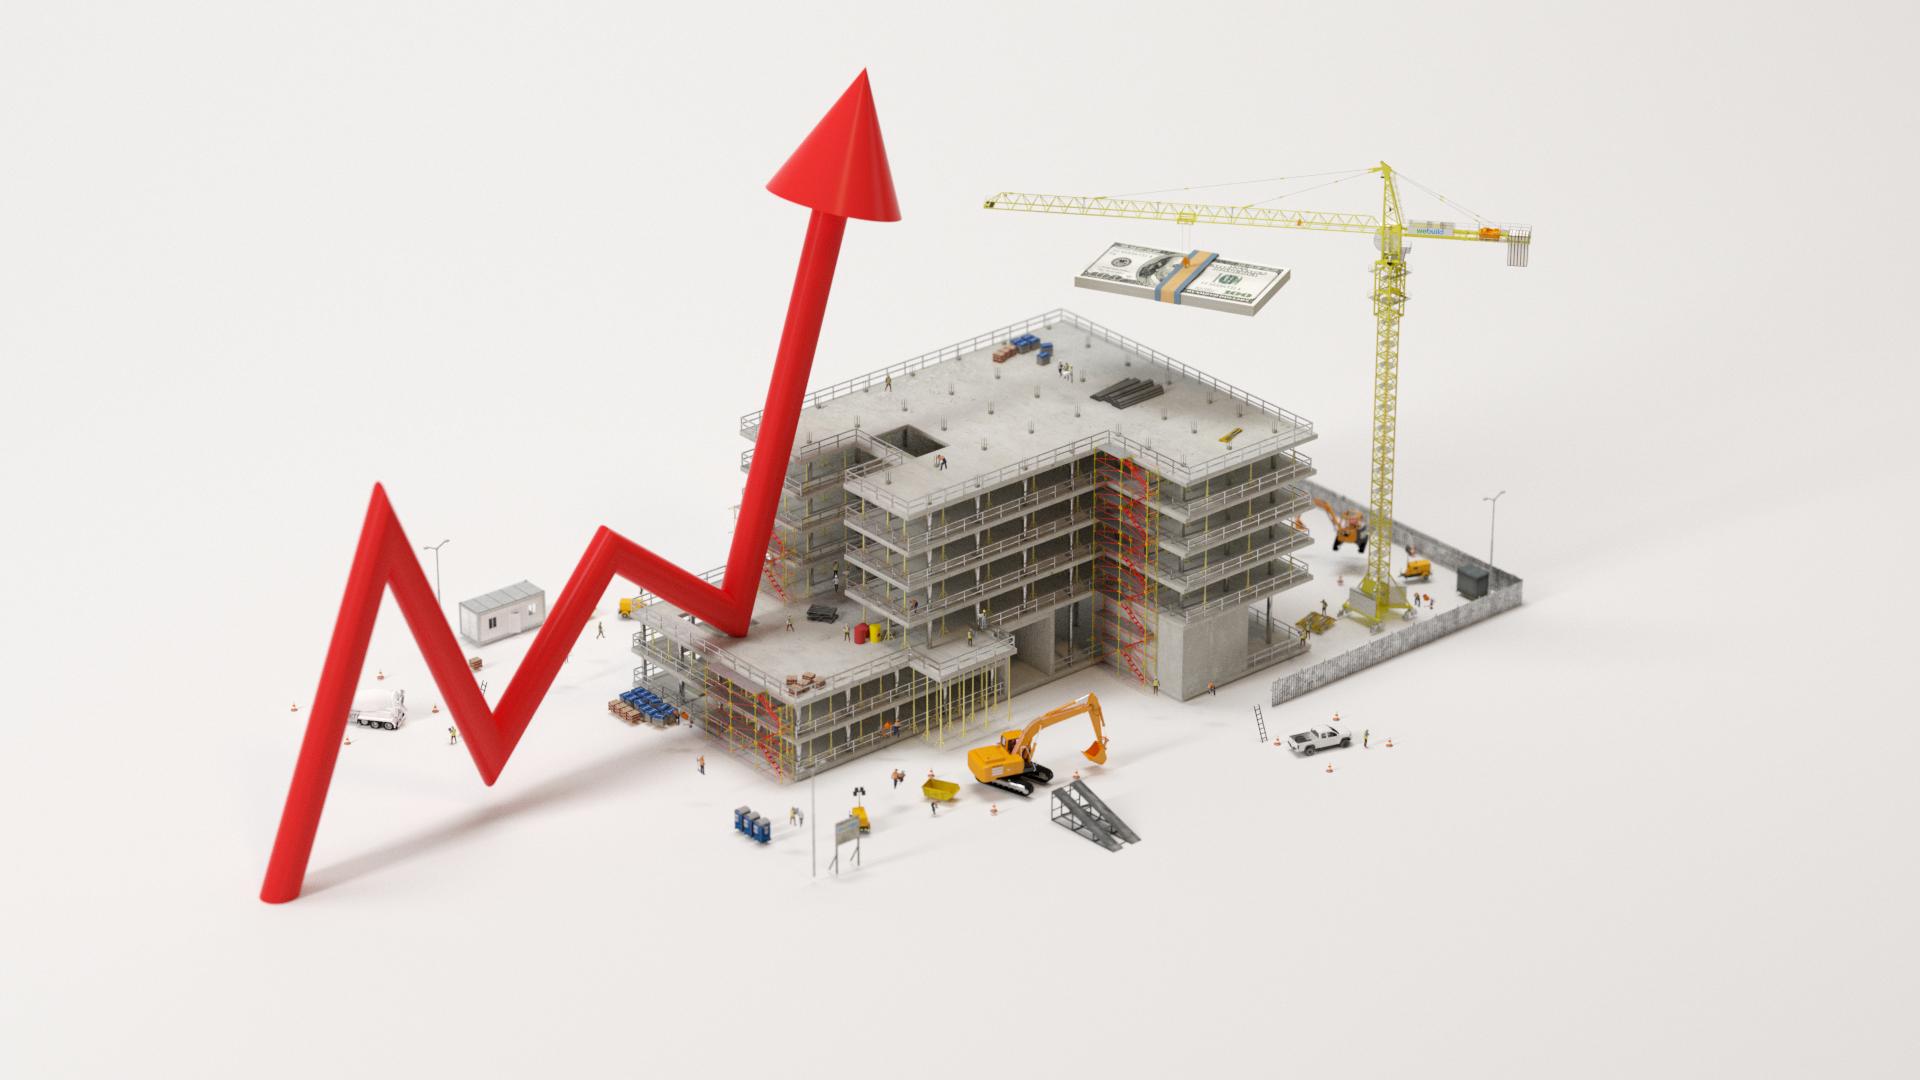 Construction Commercial spending